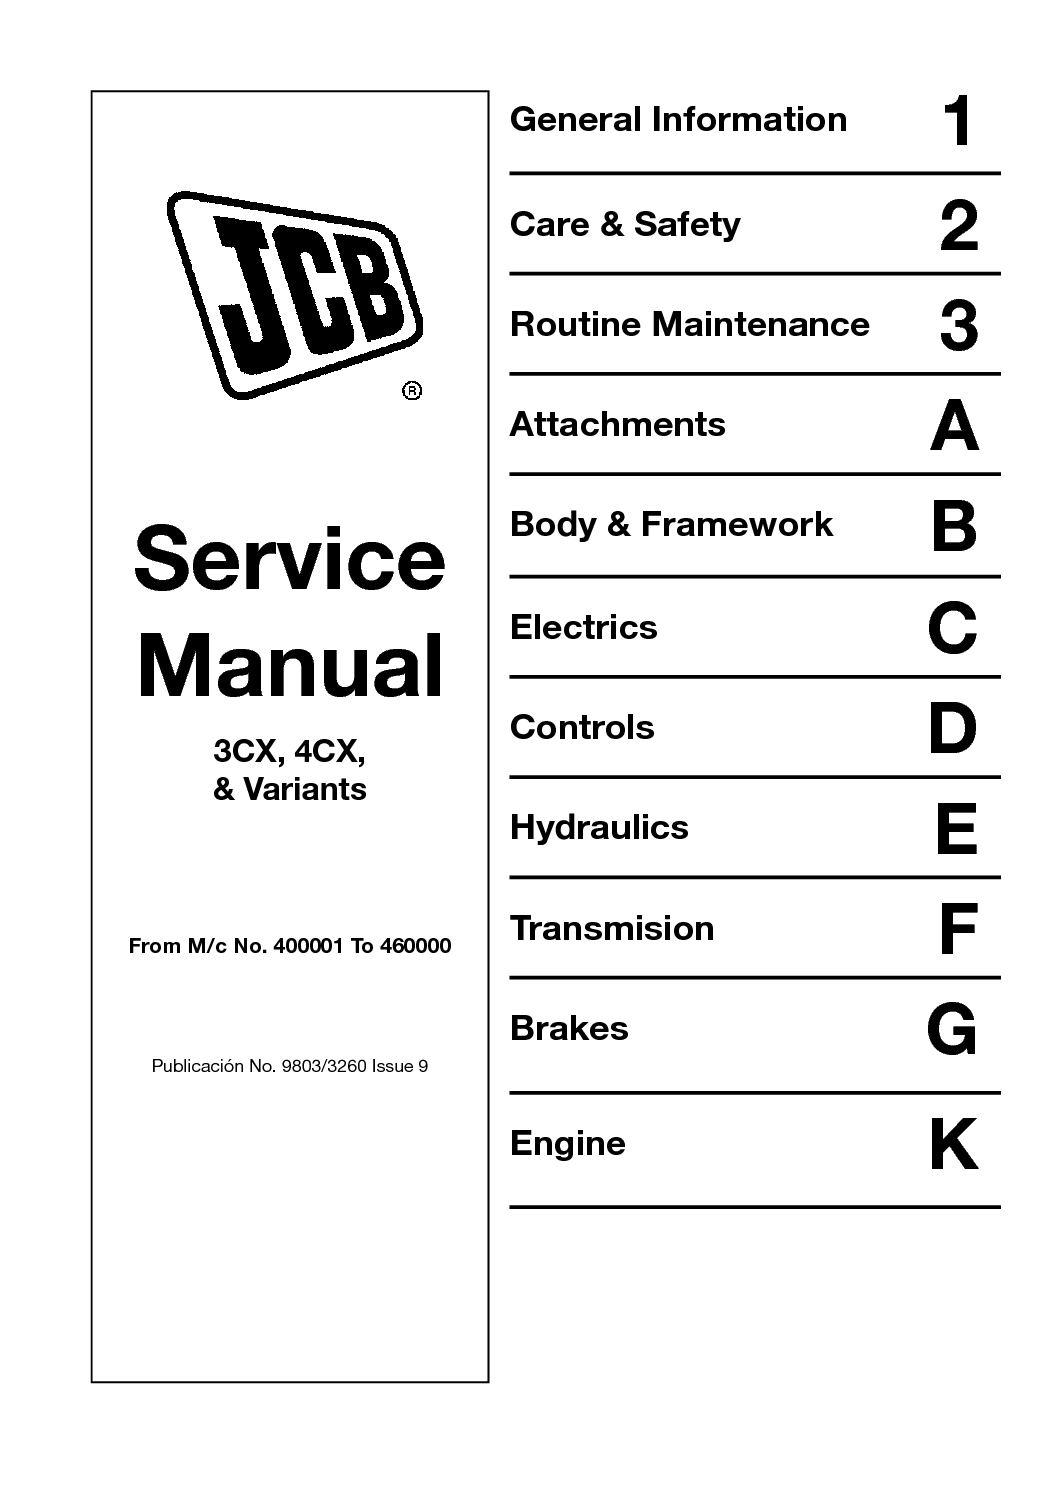 Calaméo - JCB 4CX BACKHOE LOADER Service Repair Manual (SN400001 To  4600000).